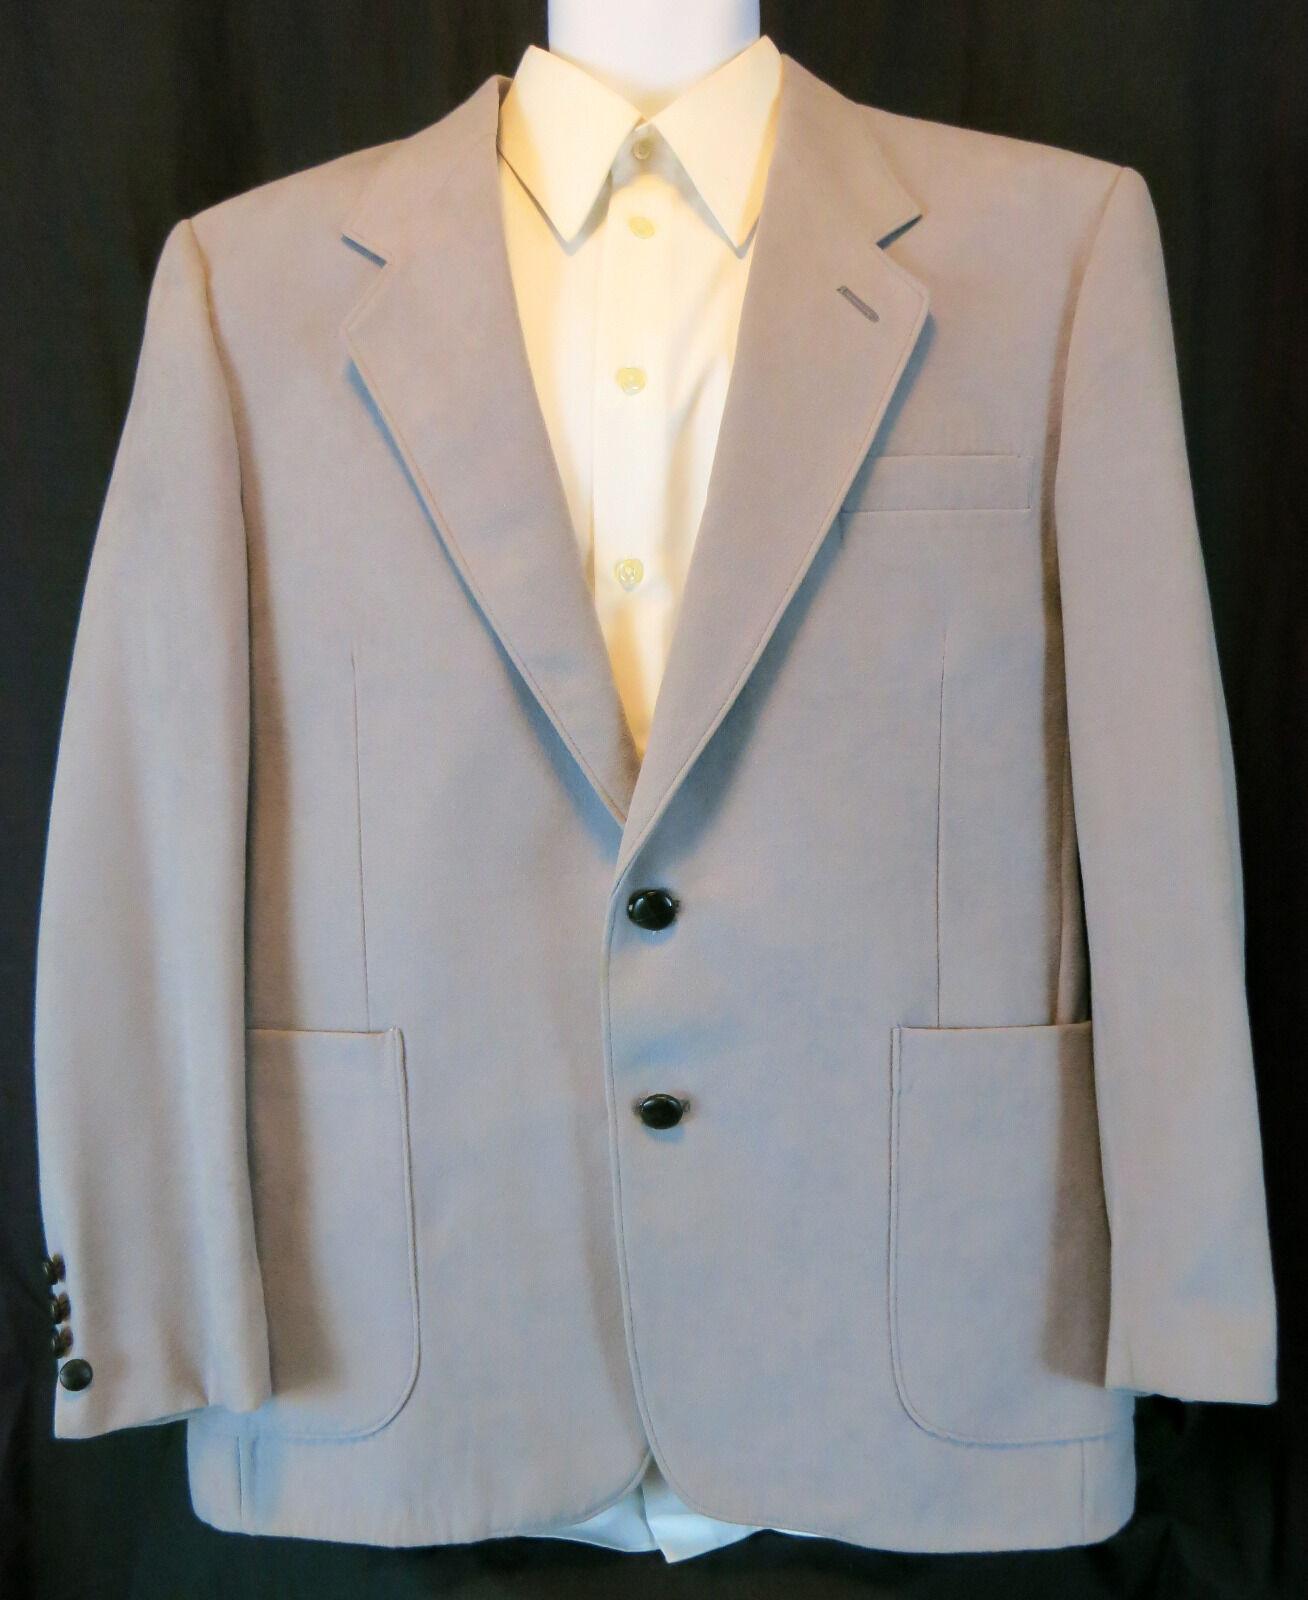 Levi's Sportswear Lt Blue/Gray 2 leather buttons 44R Blazer - $11.88